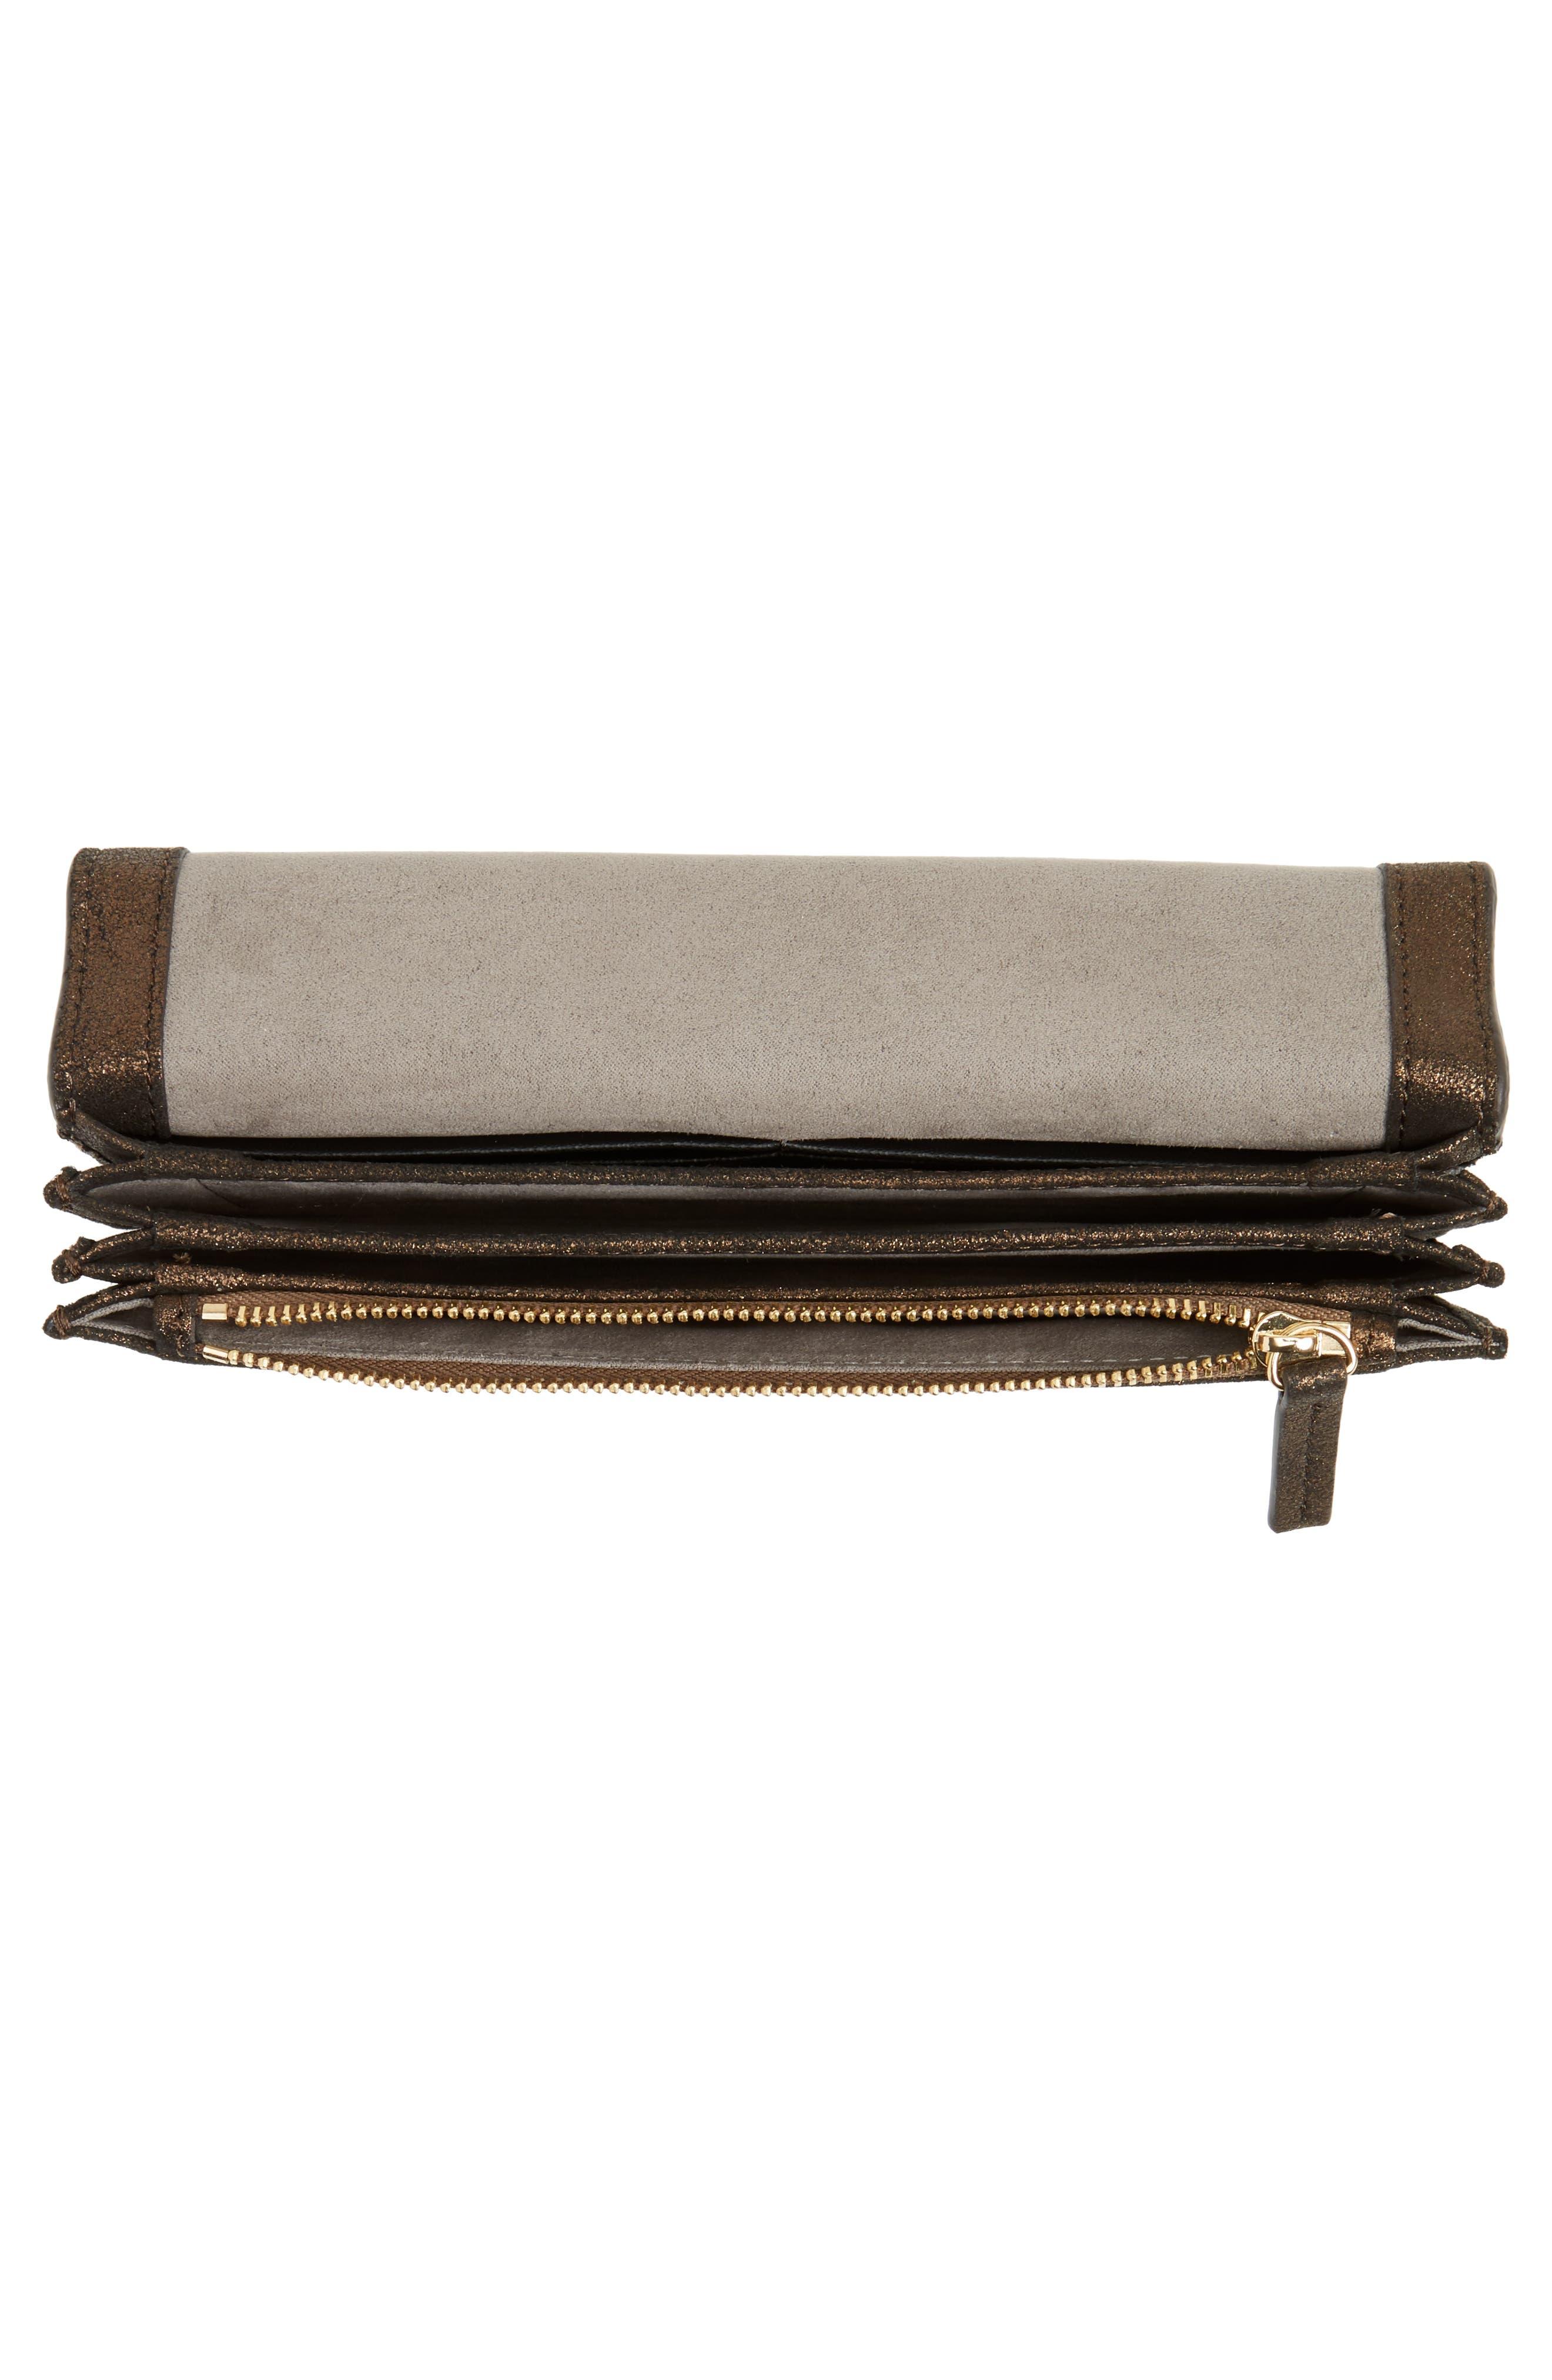 Fit Studded Leather Wallet,                             Alternate thumbnail 2, color,                             Antique Bronze